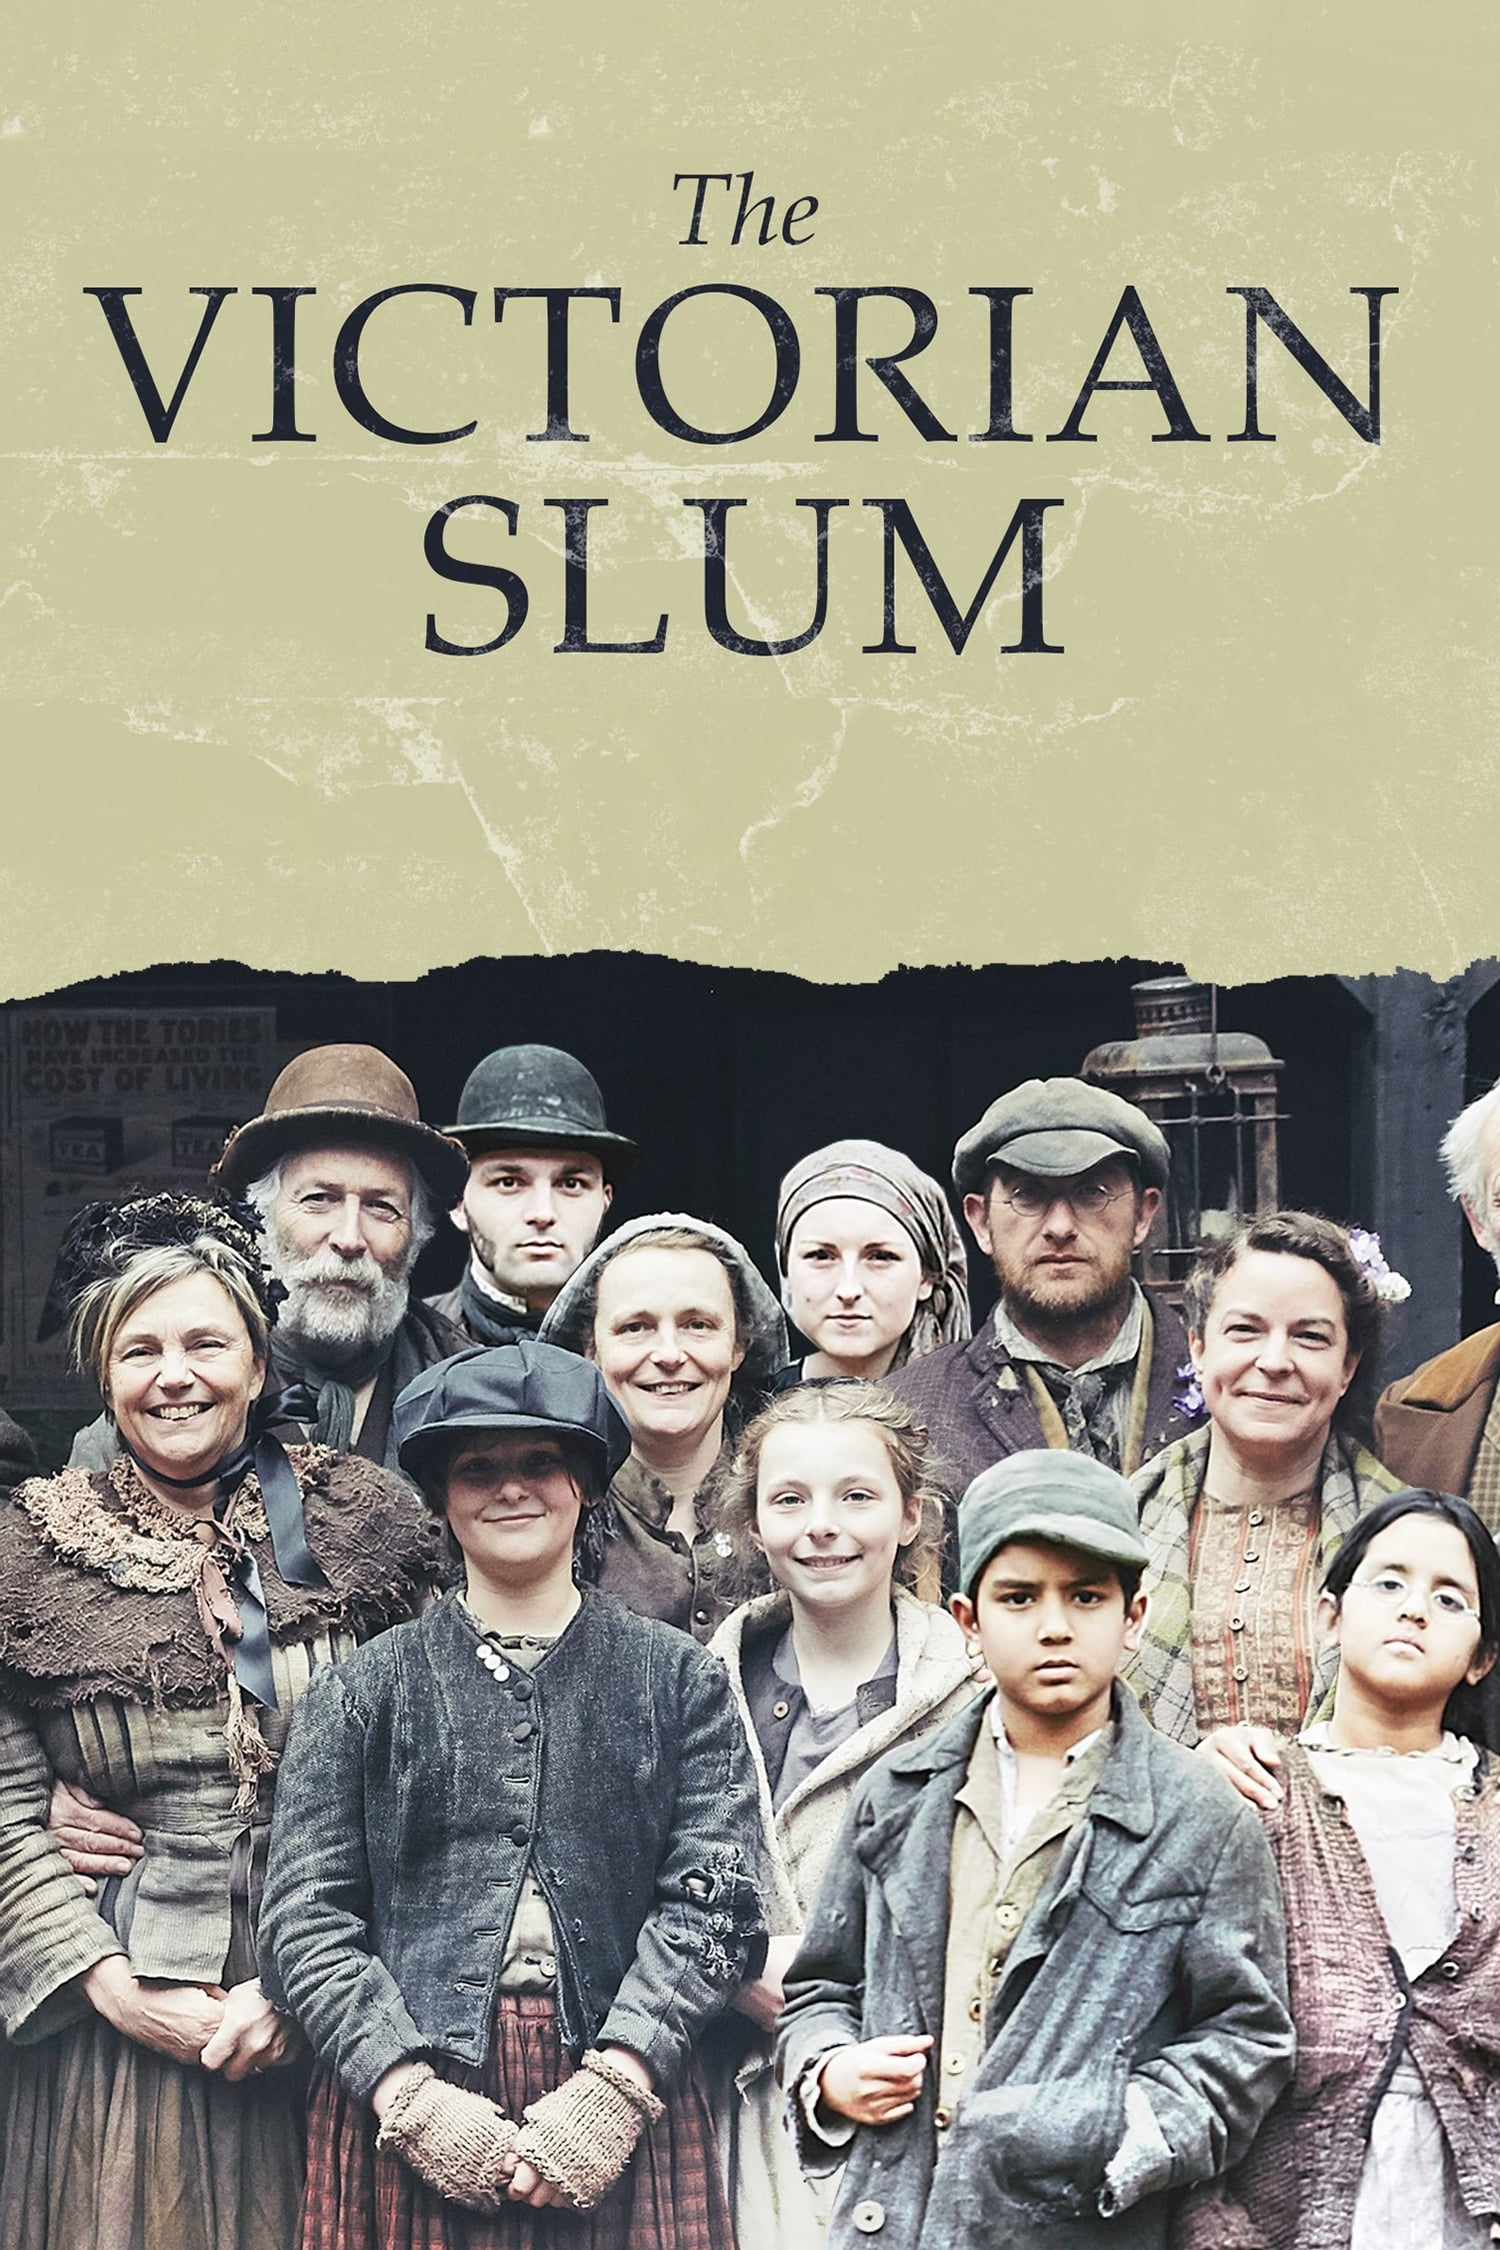 The Victorian Slum TV Shows About Victorian England